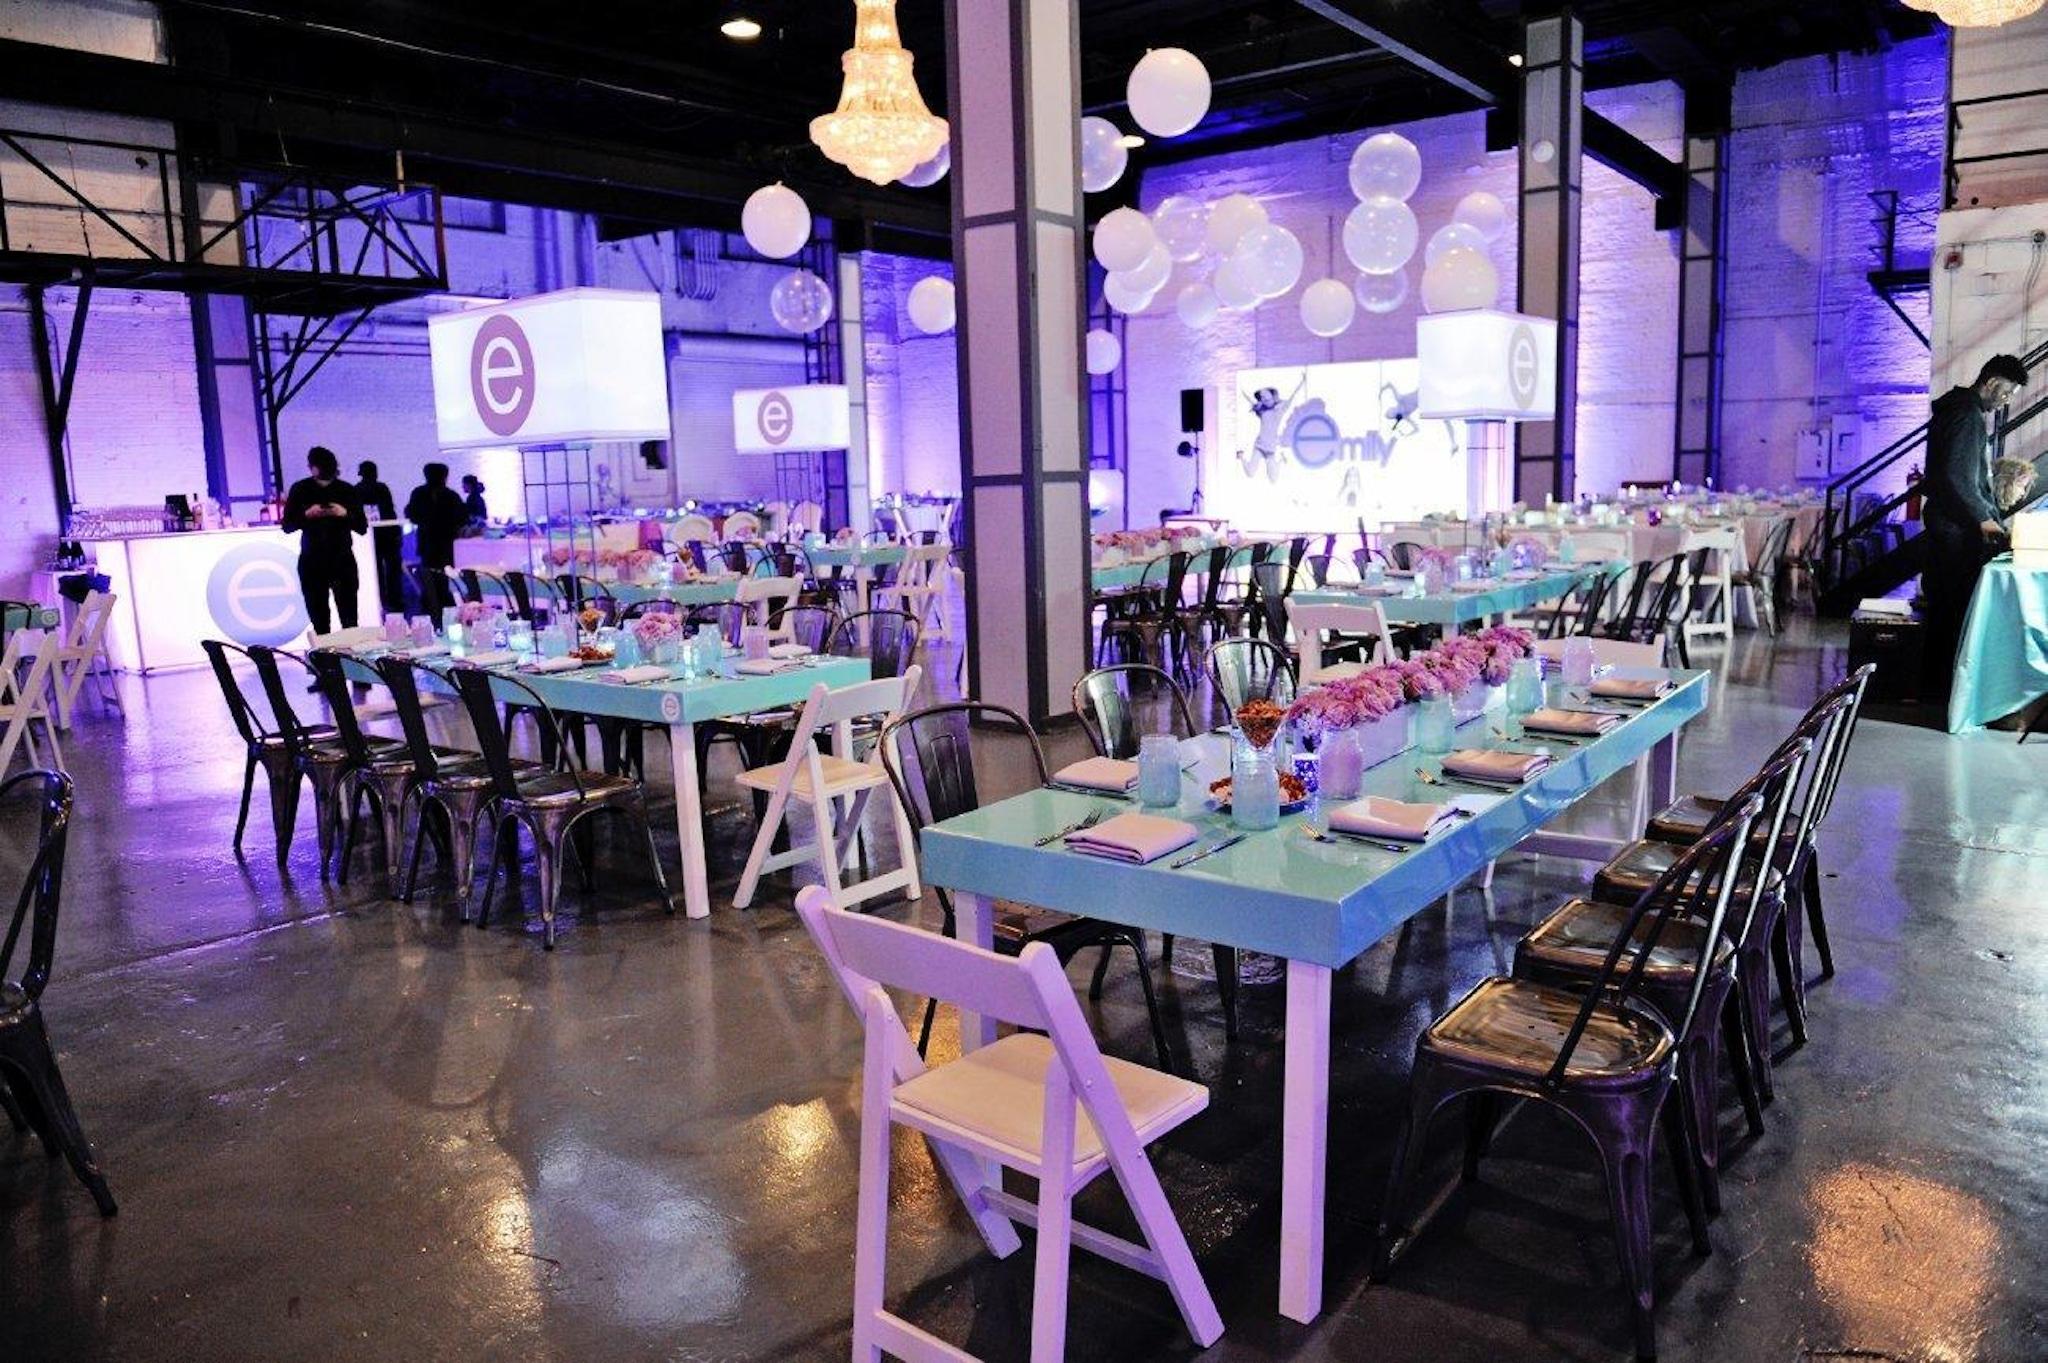 Top Mitzvah planners Chicago - ELAINE KLEIN EVENTS